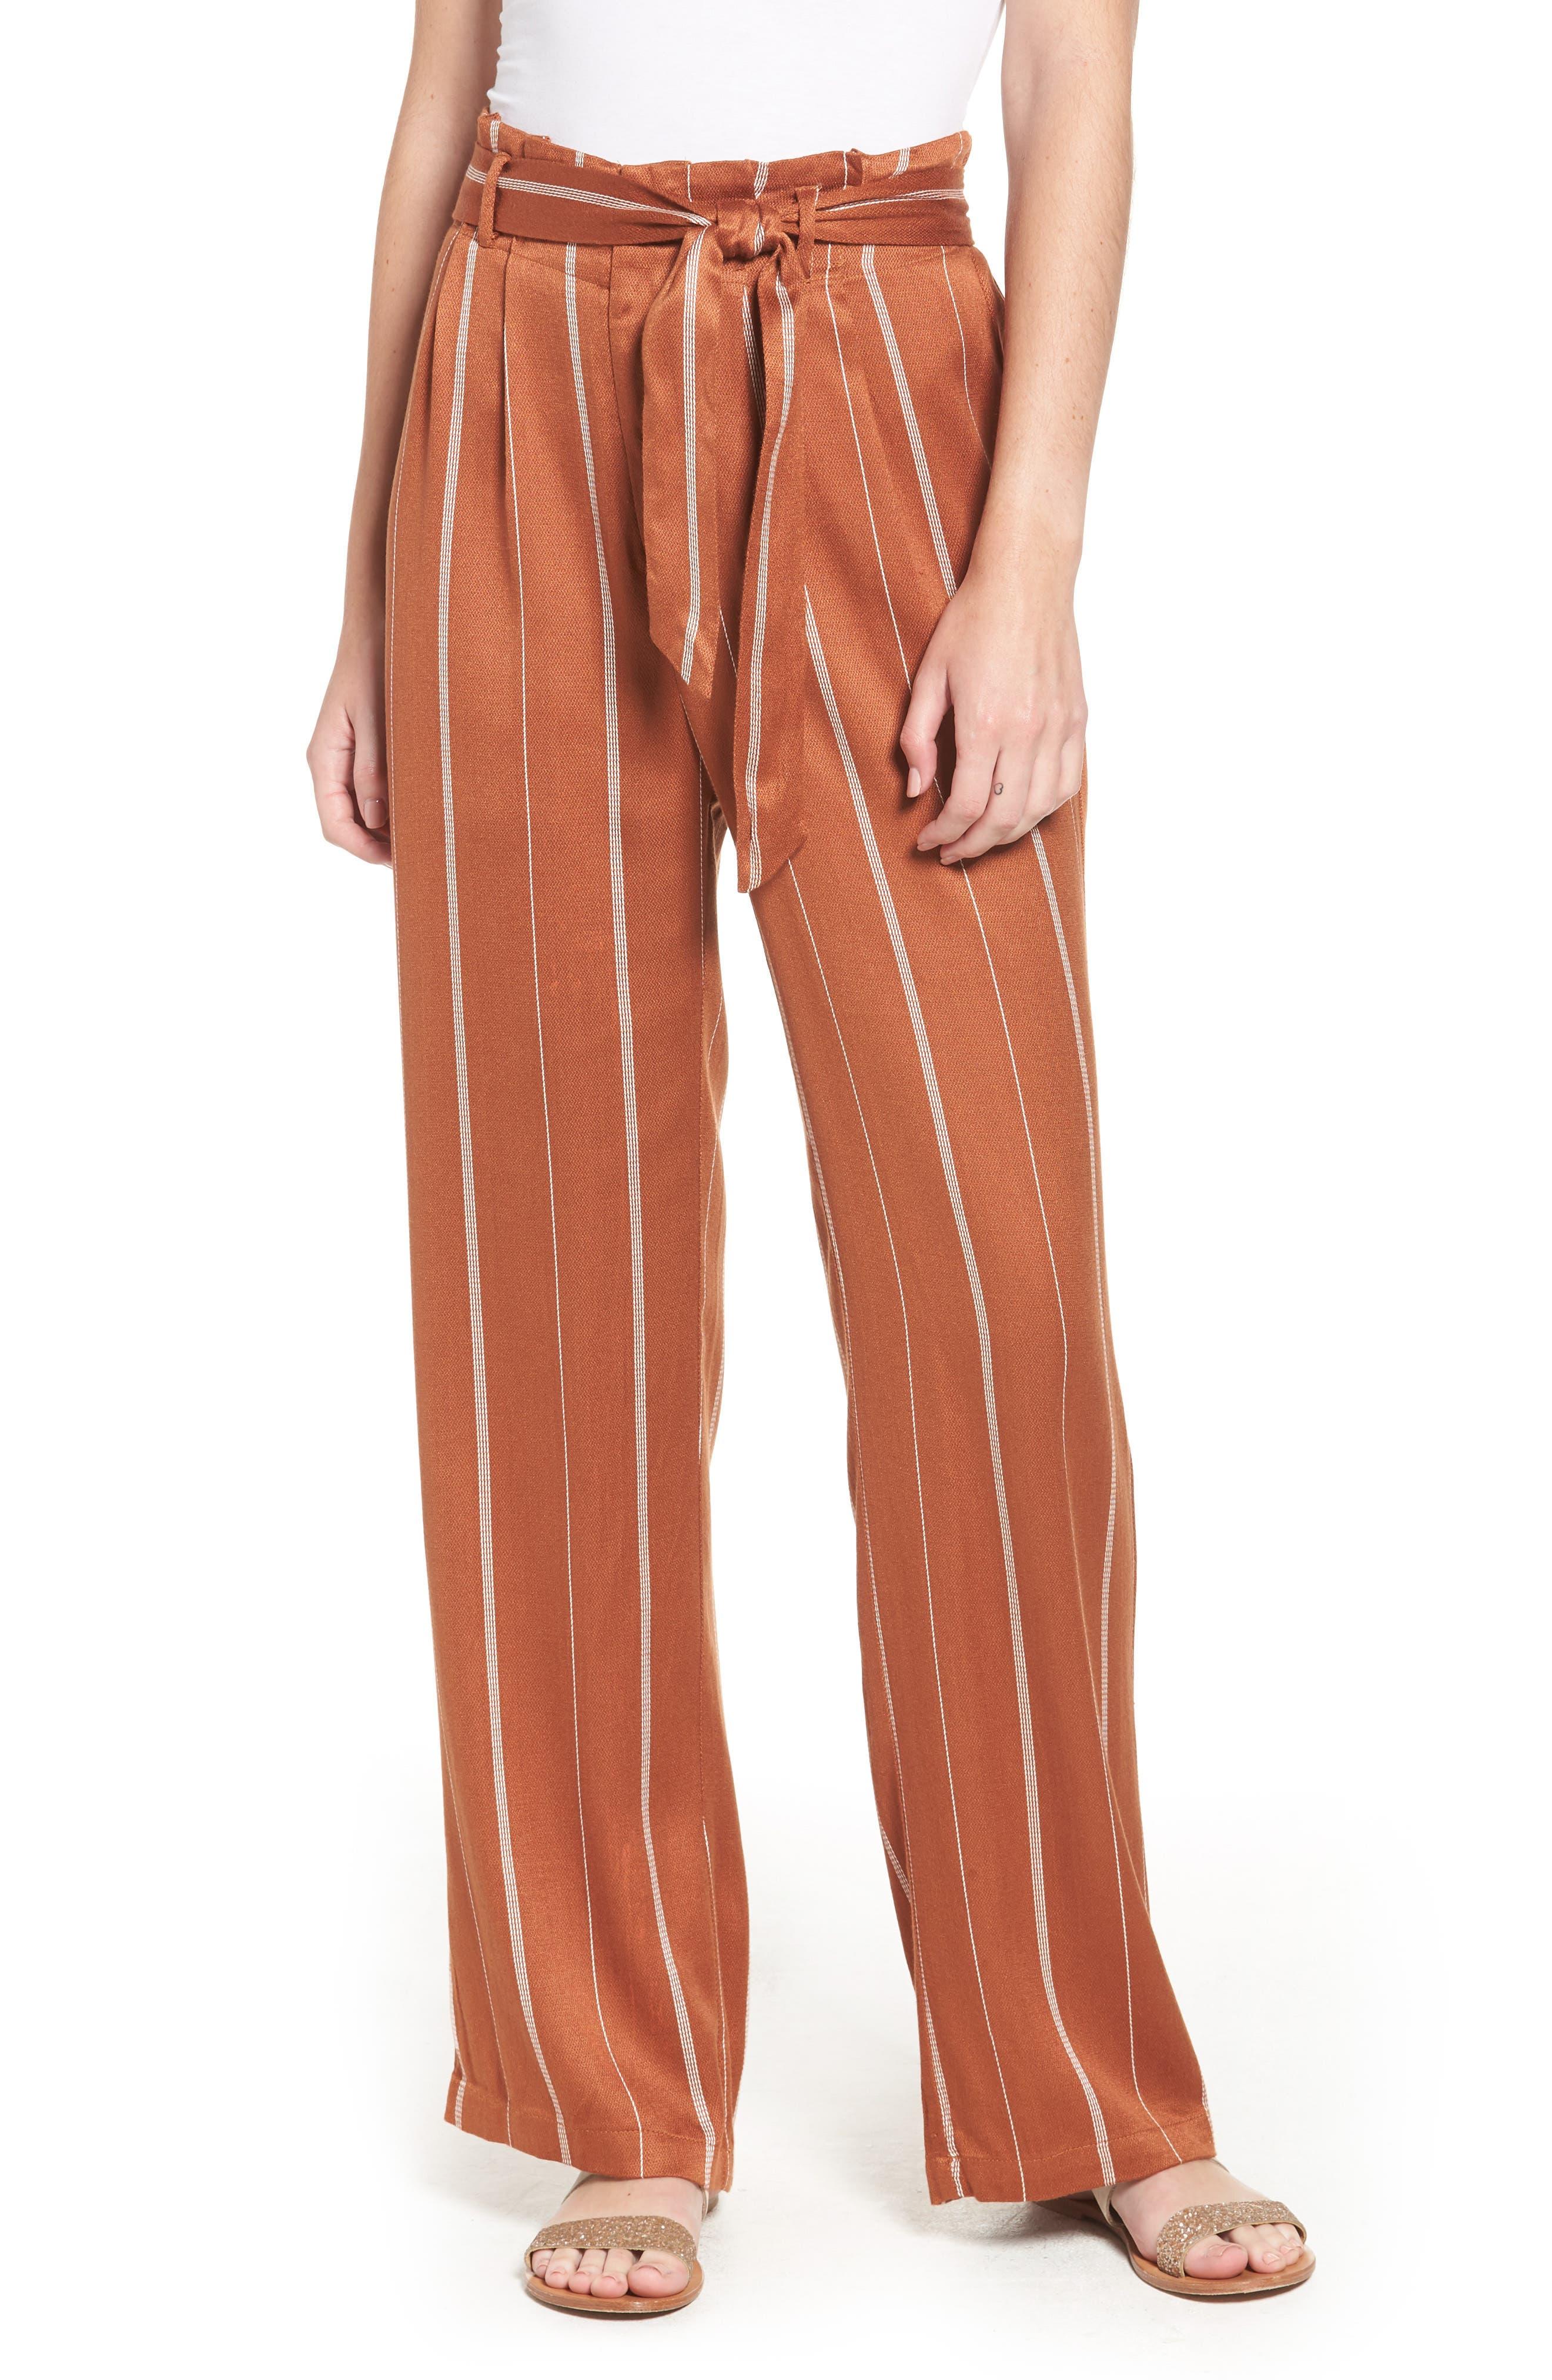 Paperbag Waist Pants,                         Main,                         color, RUST CIDER/ CREAM STRIPES